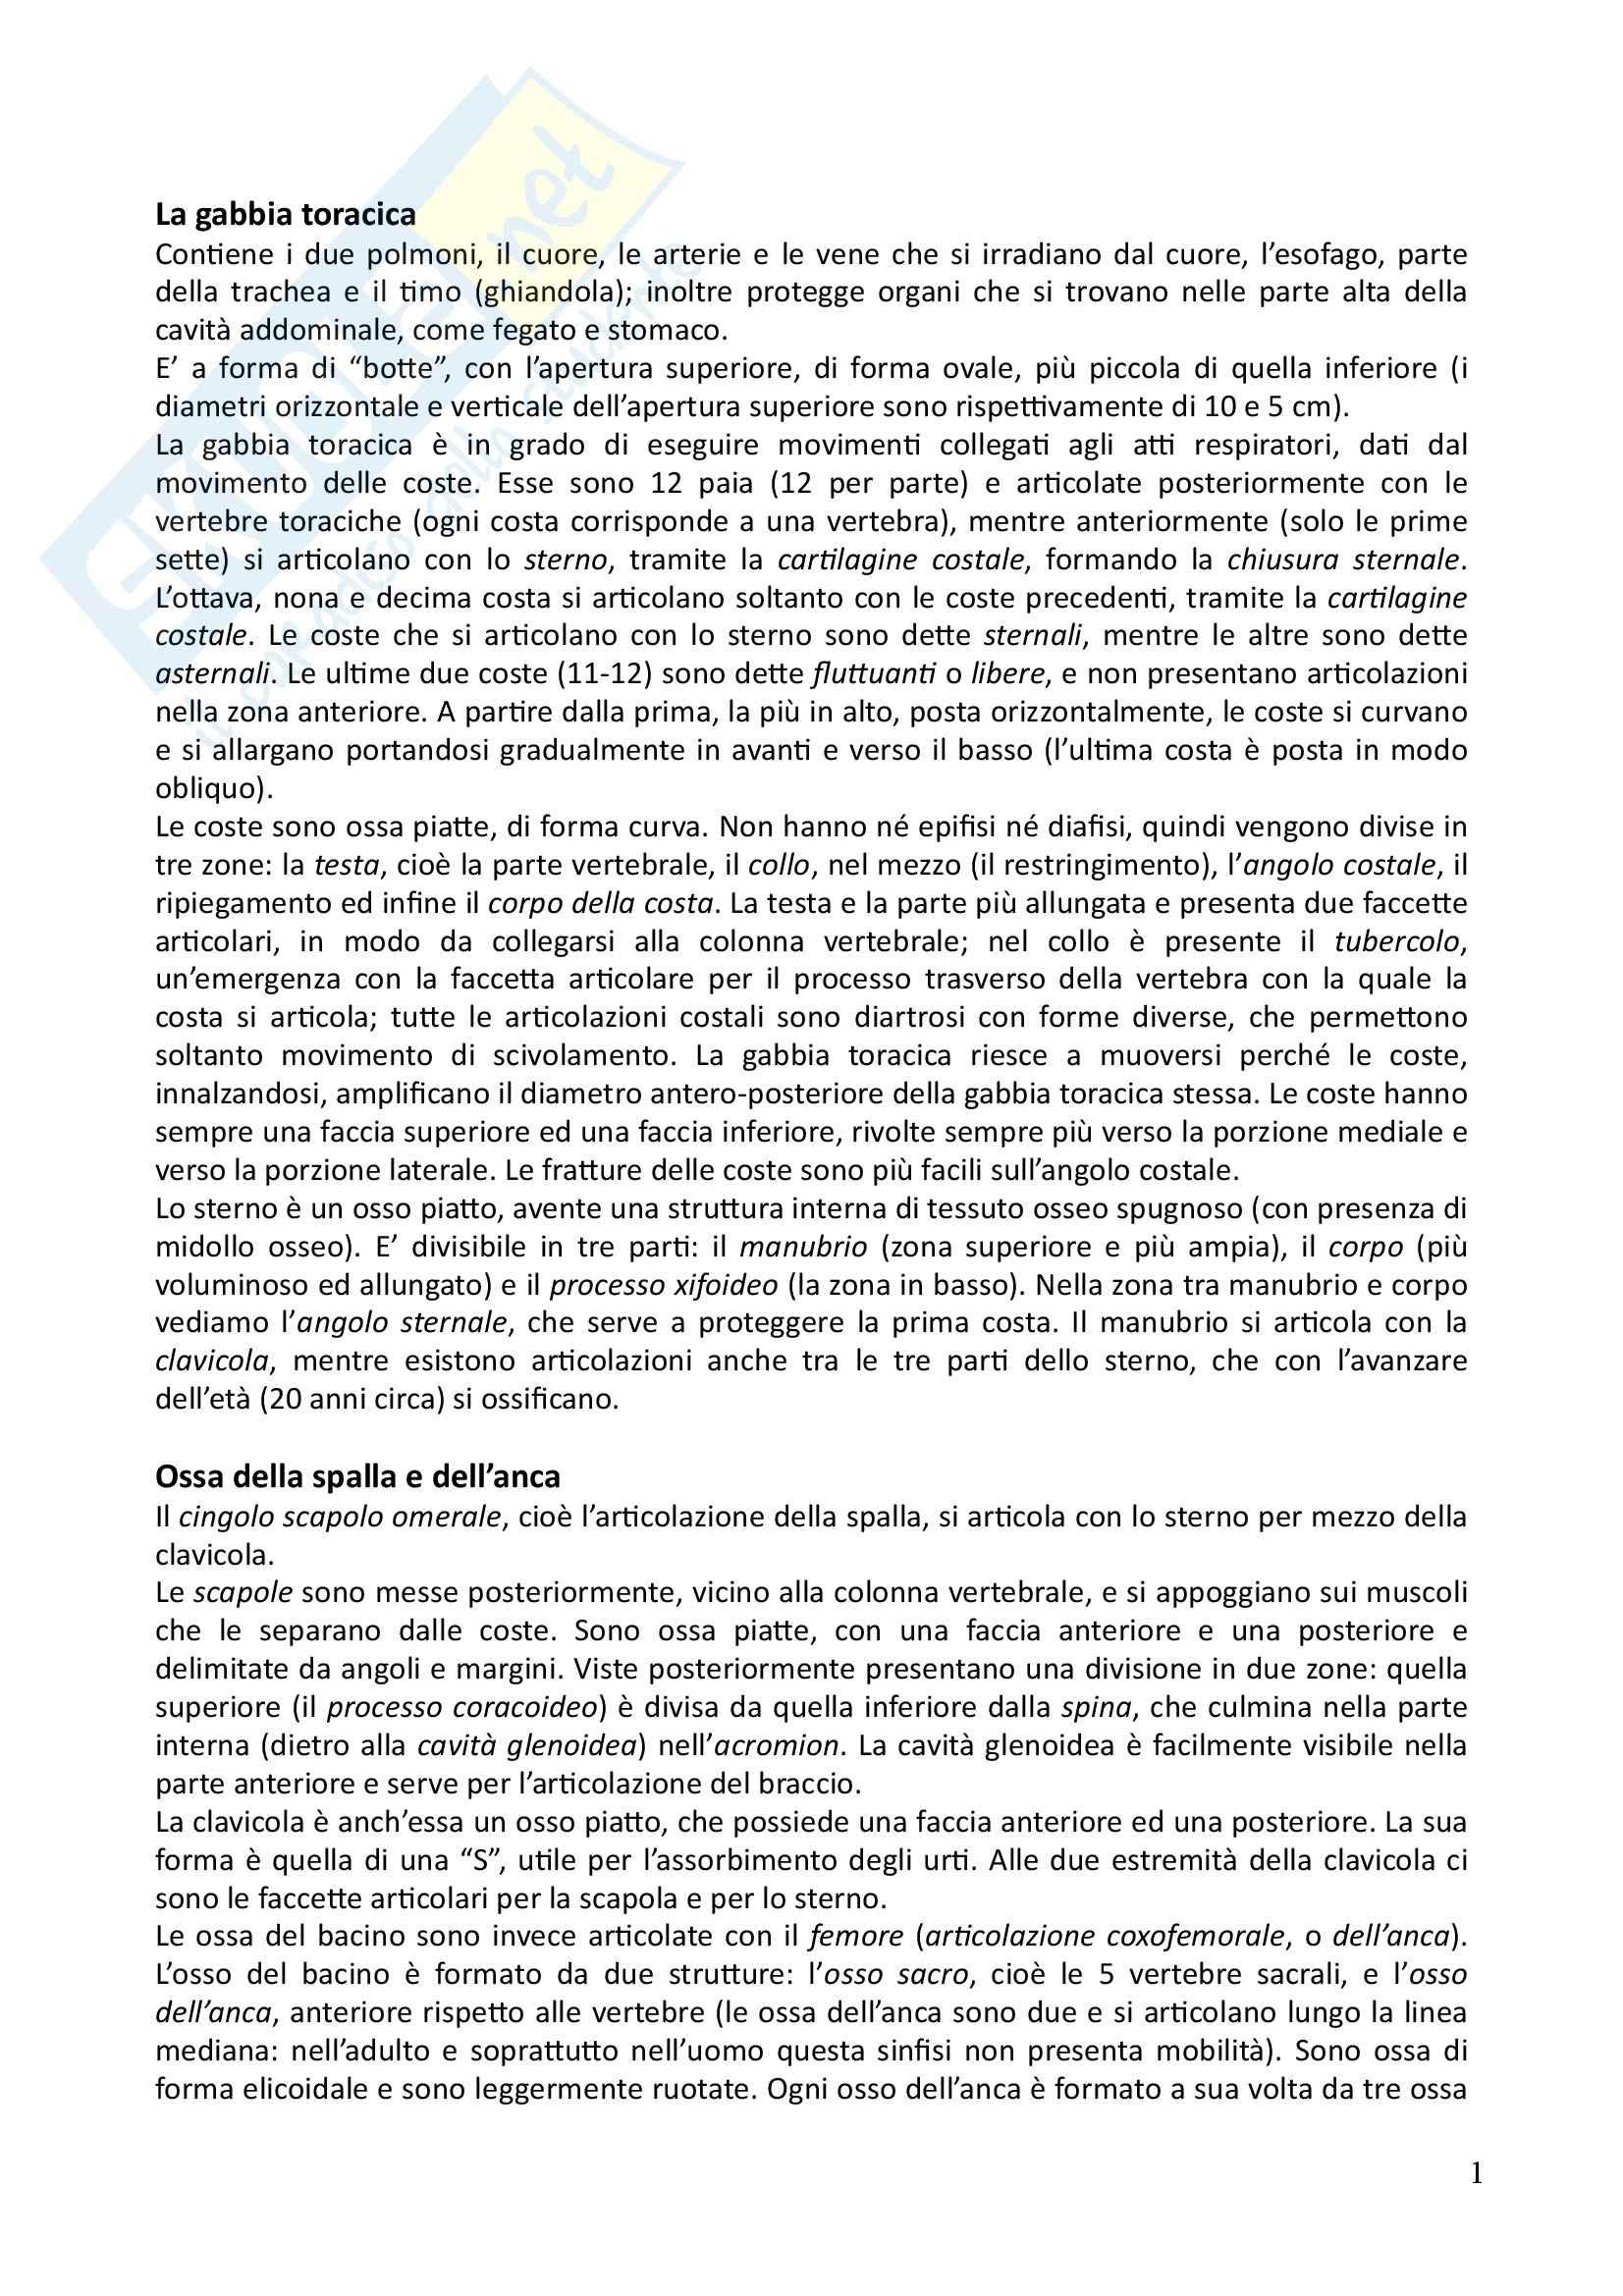 Riassunto esame Anatomia Umana, prof. Turci, libro consigliato Anatomia Umana, Martini, Timmons, Tallitsch Pag. 11